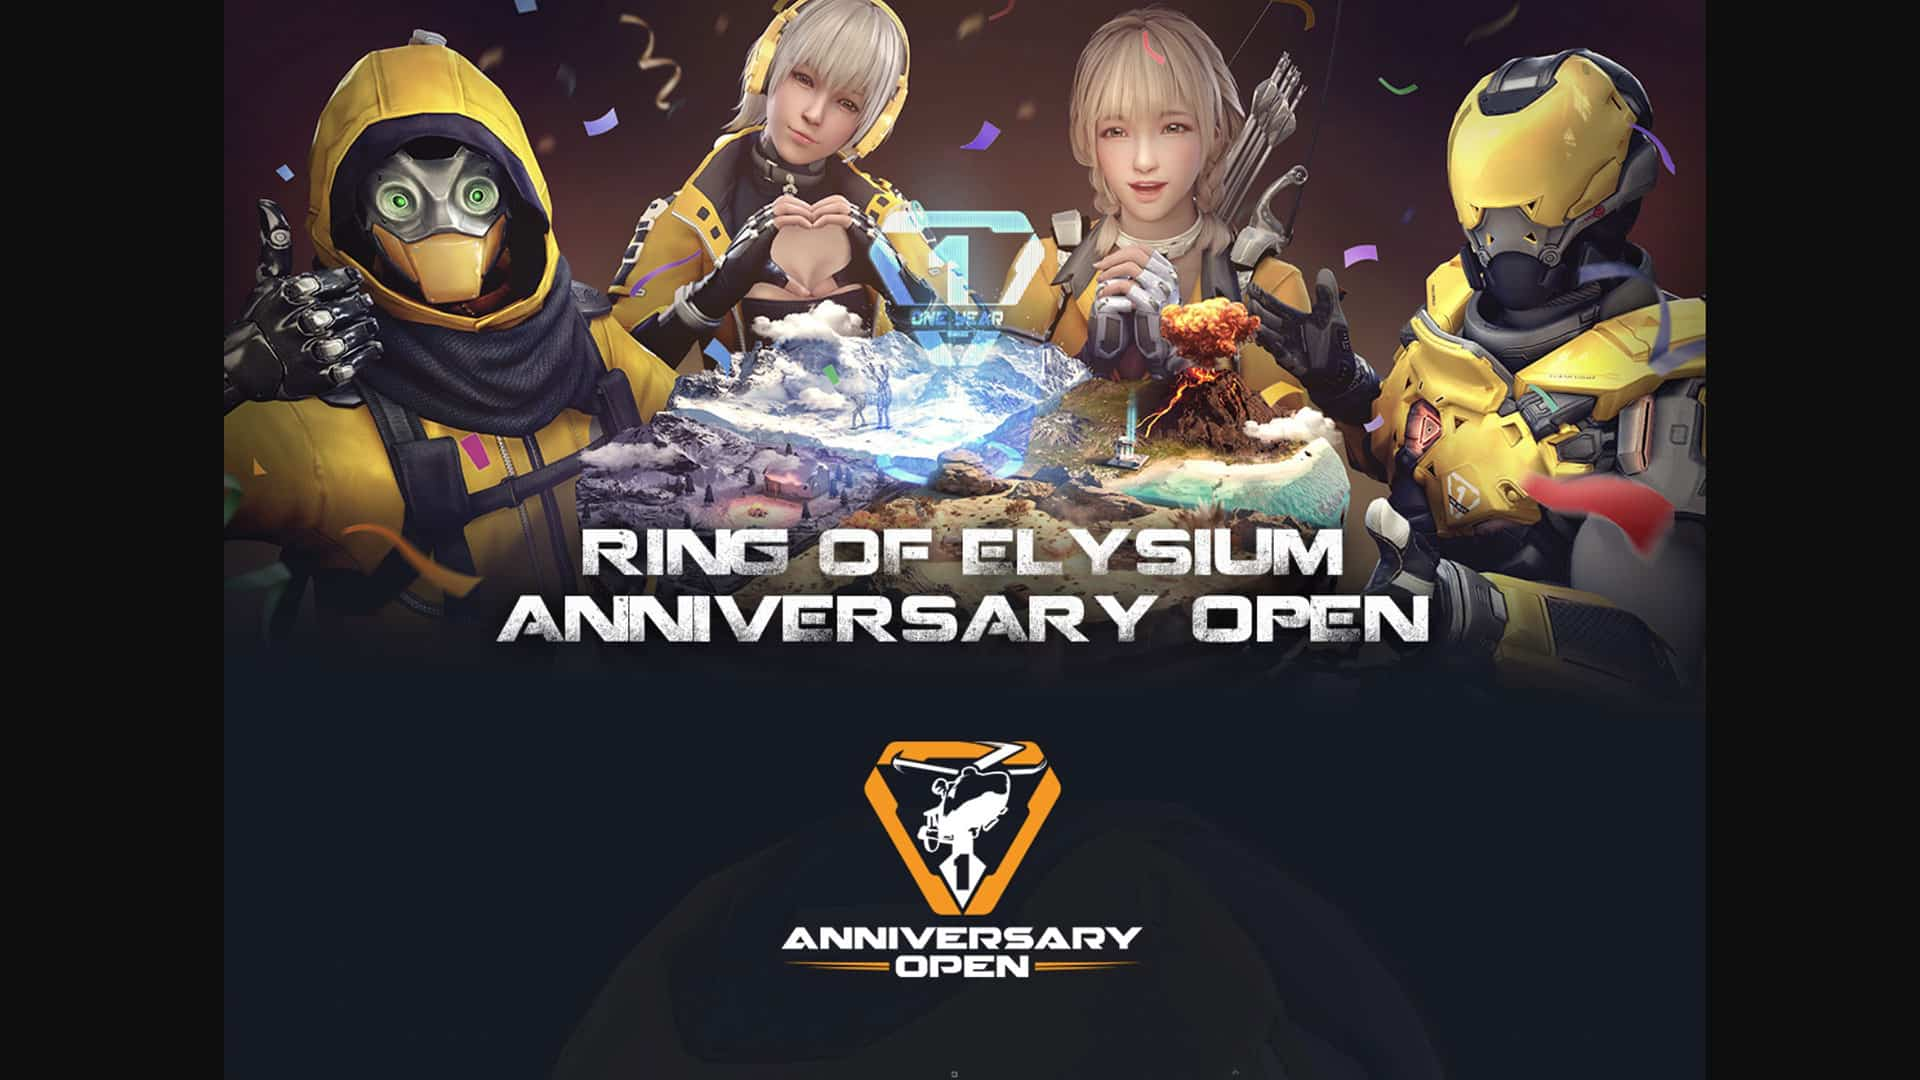 RoE anniversary open babt